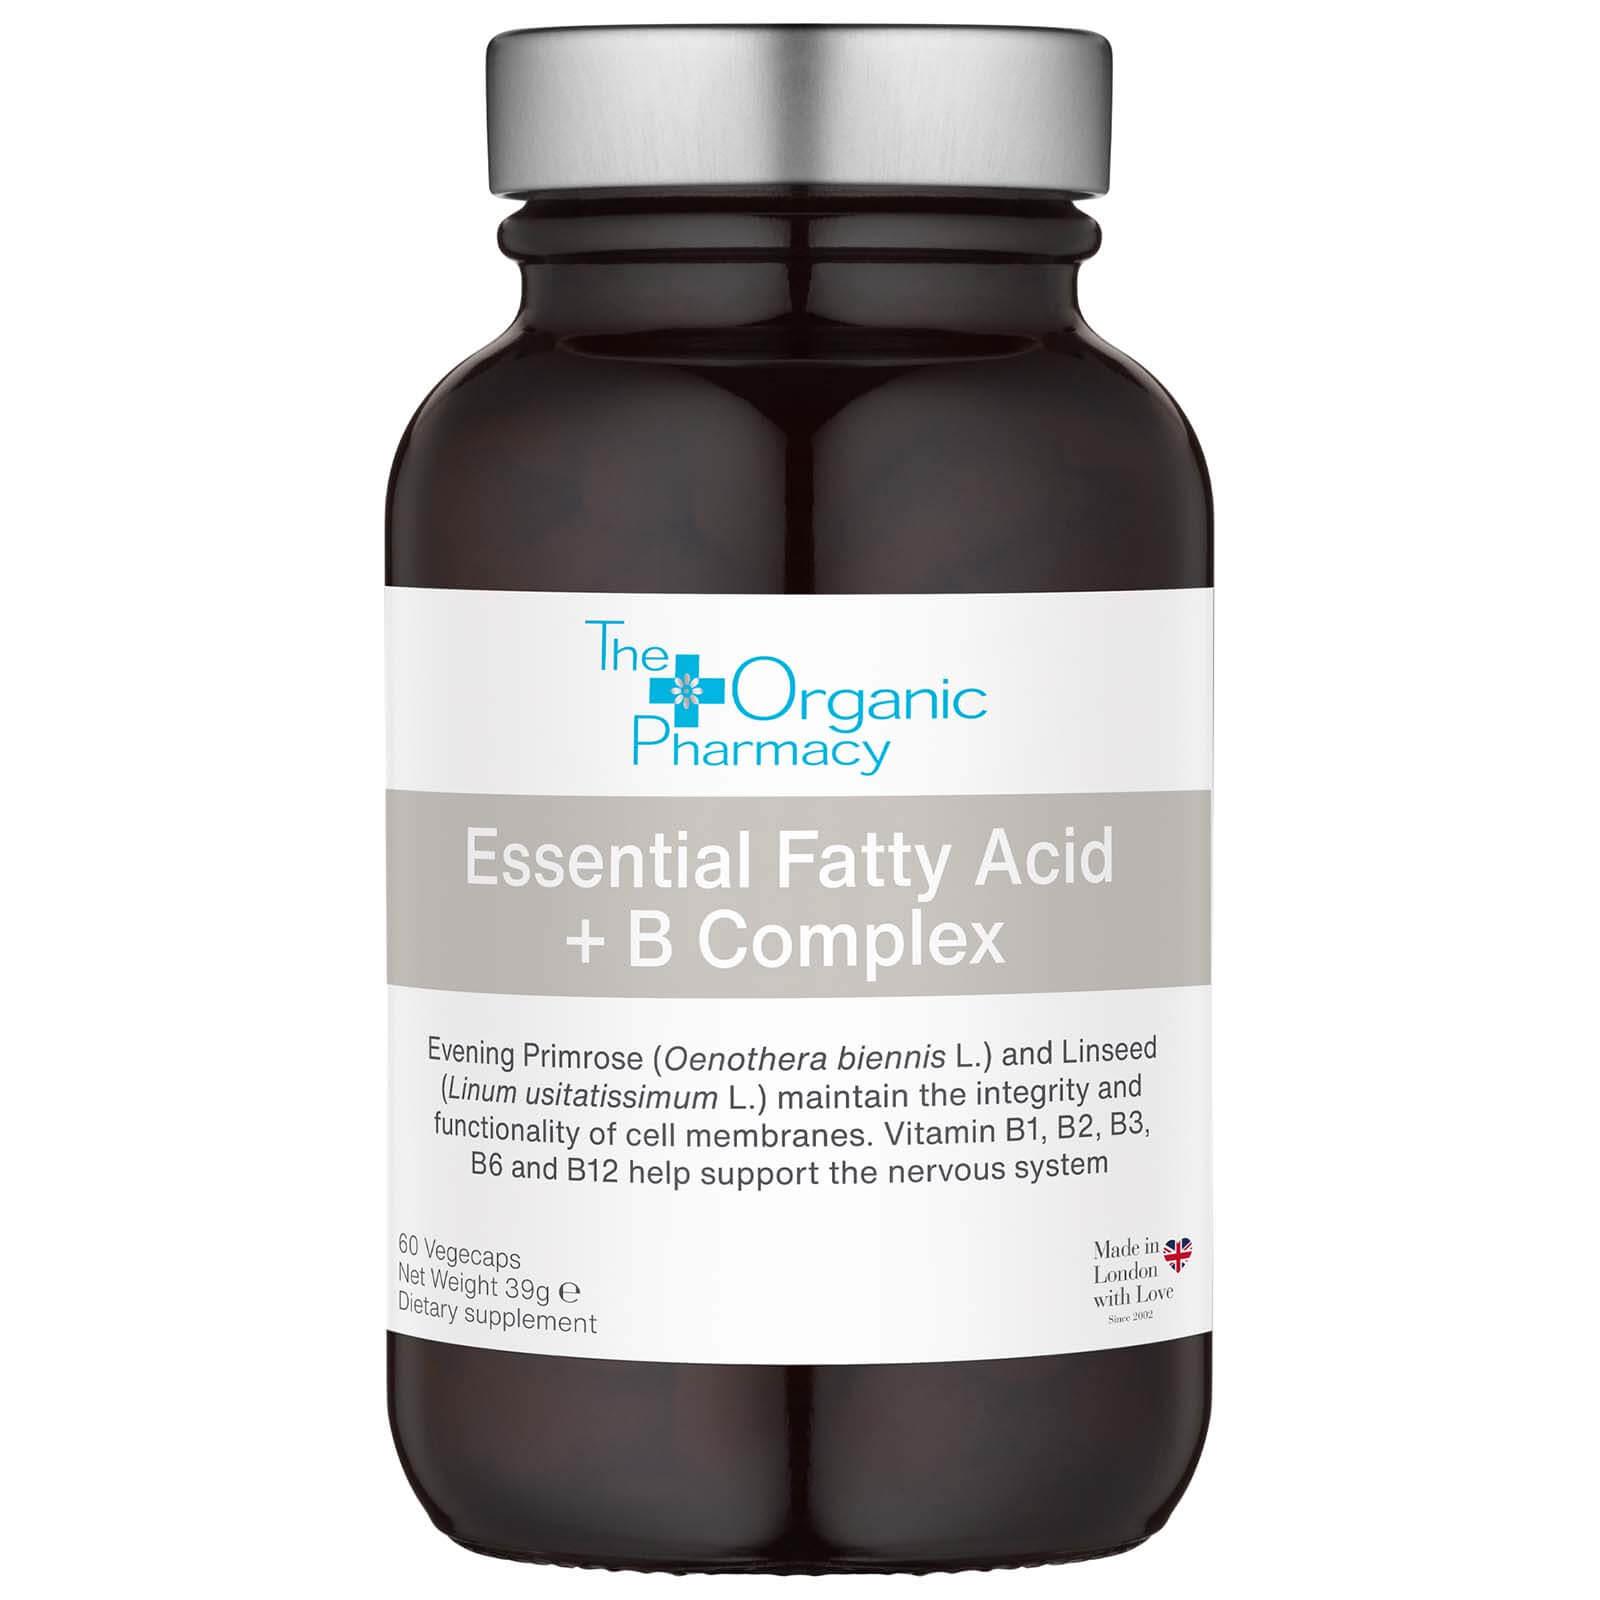 The Organic Pharmacy Essential Fatty Acid + B Complex 120g